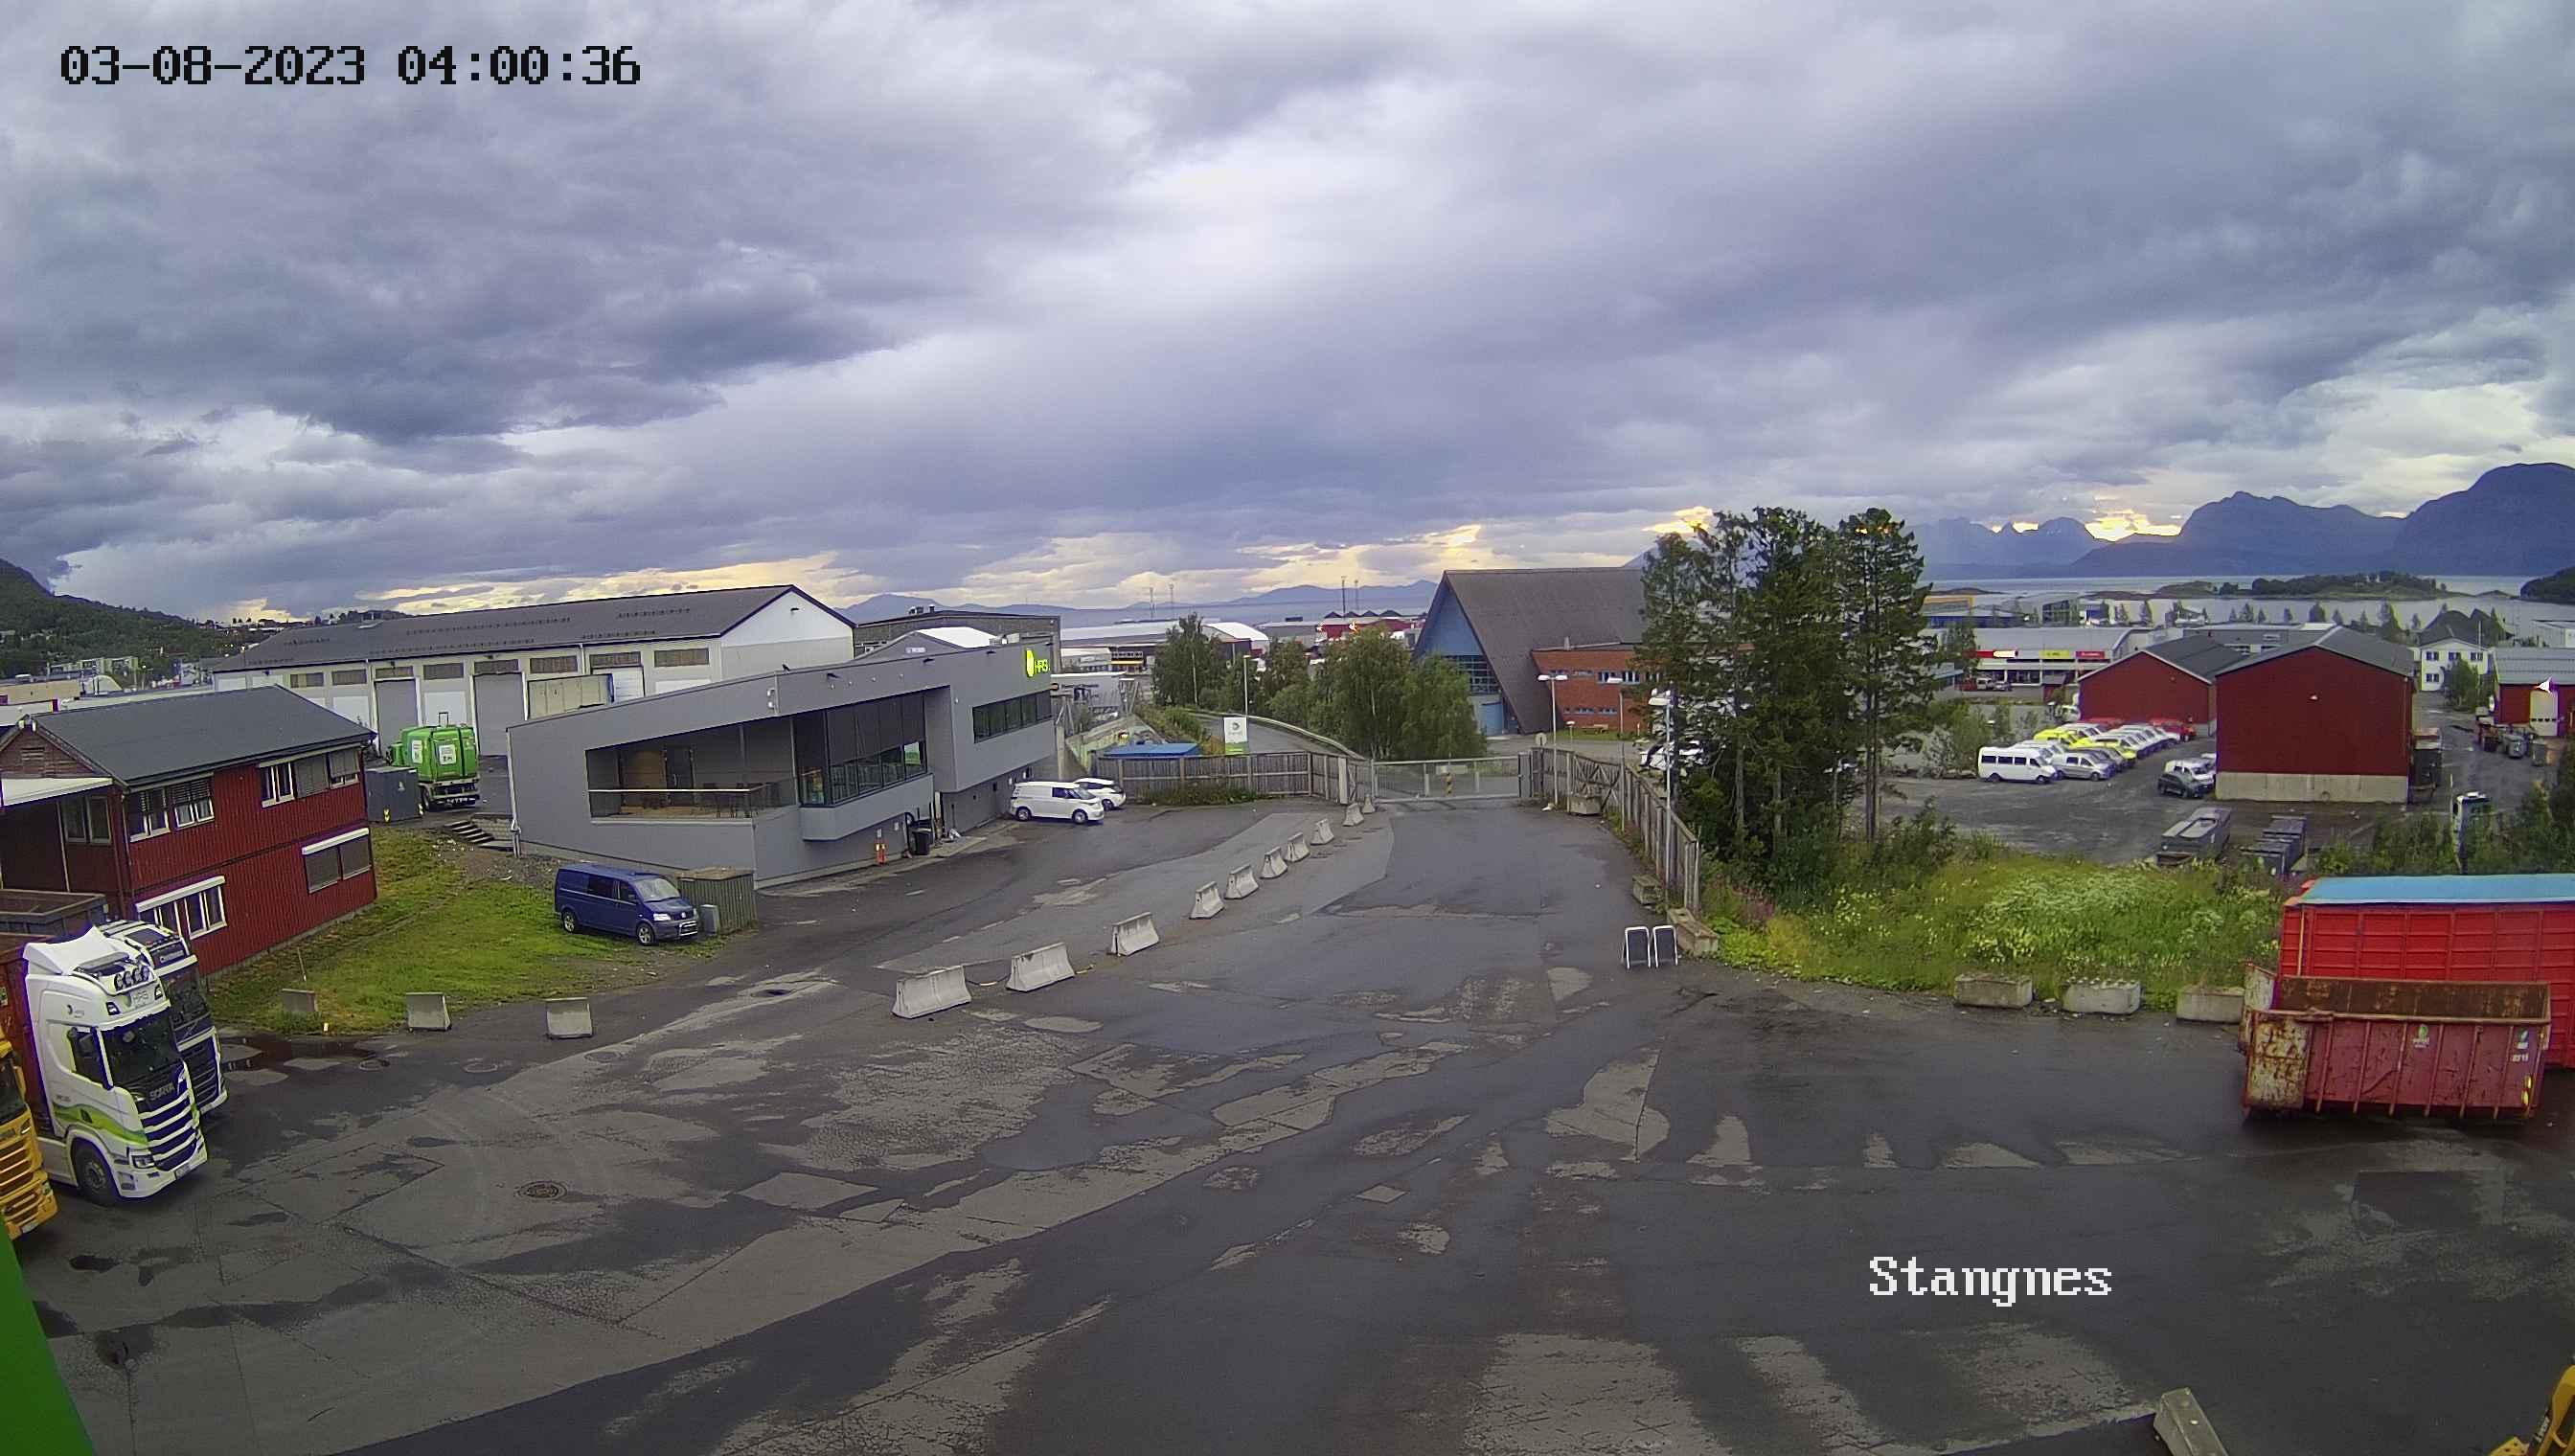 Webkamera bilde stangnes miljøpark